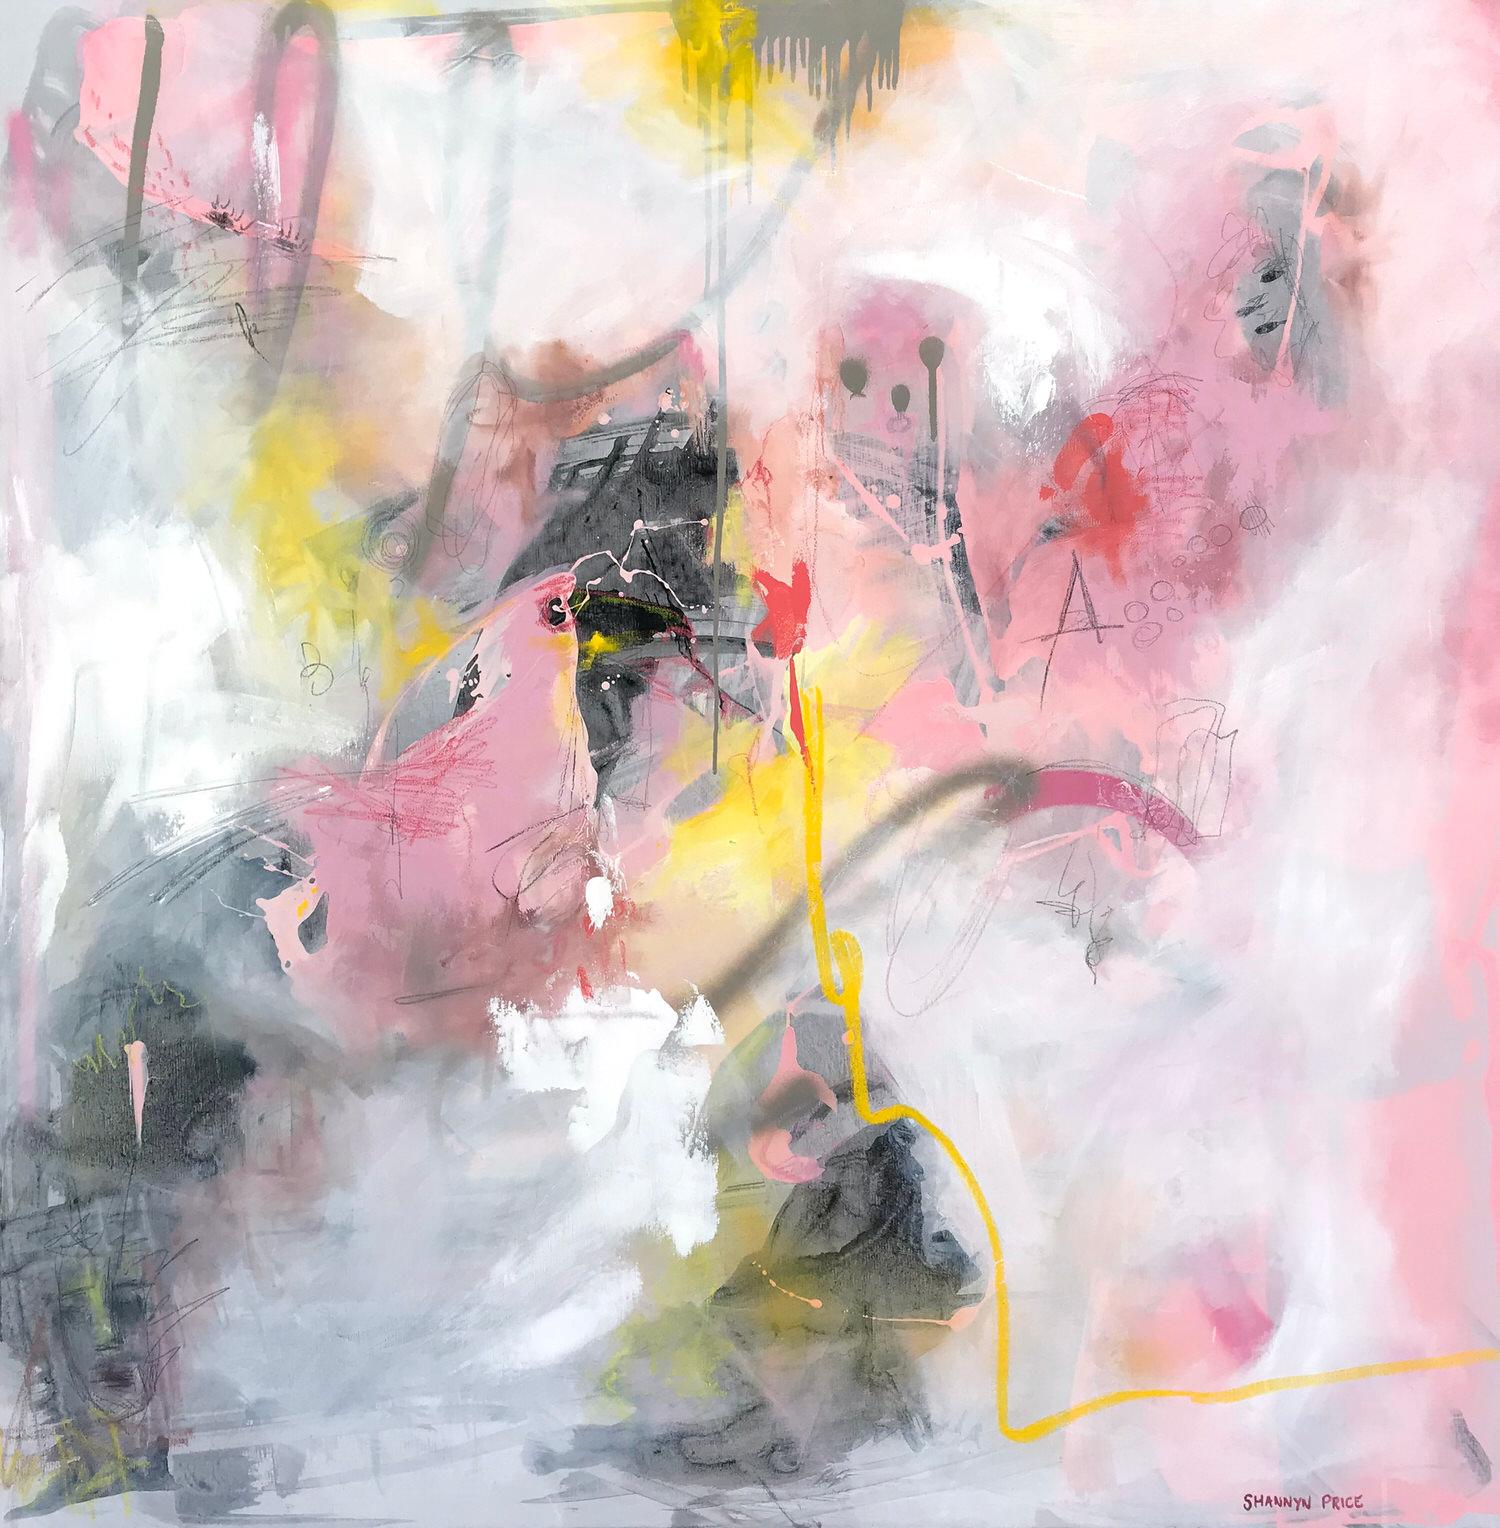 Shannyn Alexene PriceFlutter, 2019 Mixed Media on Canvas 122 x 122 cm.jpg